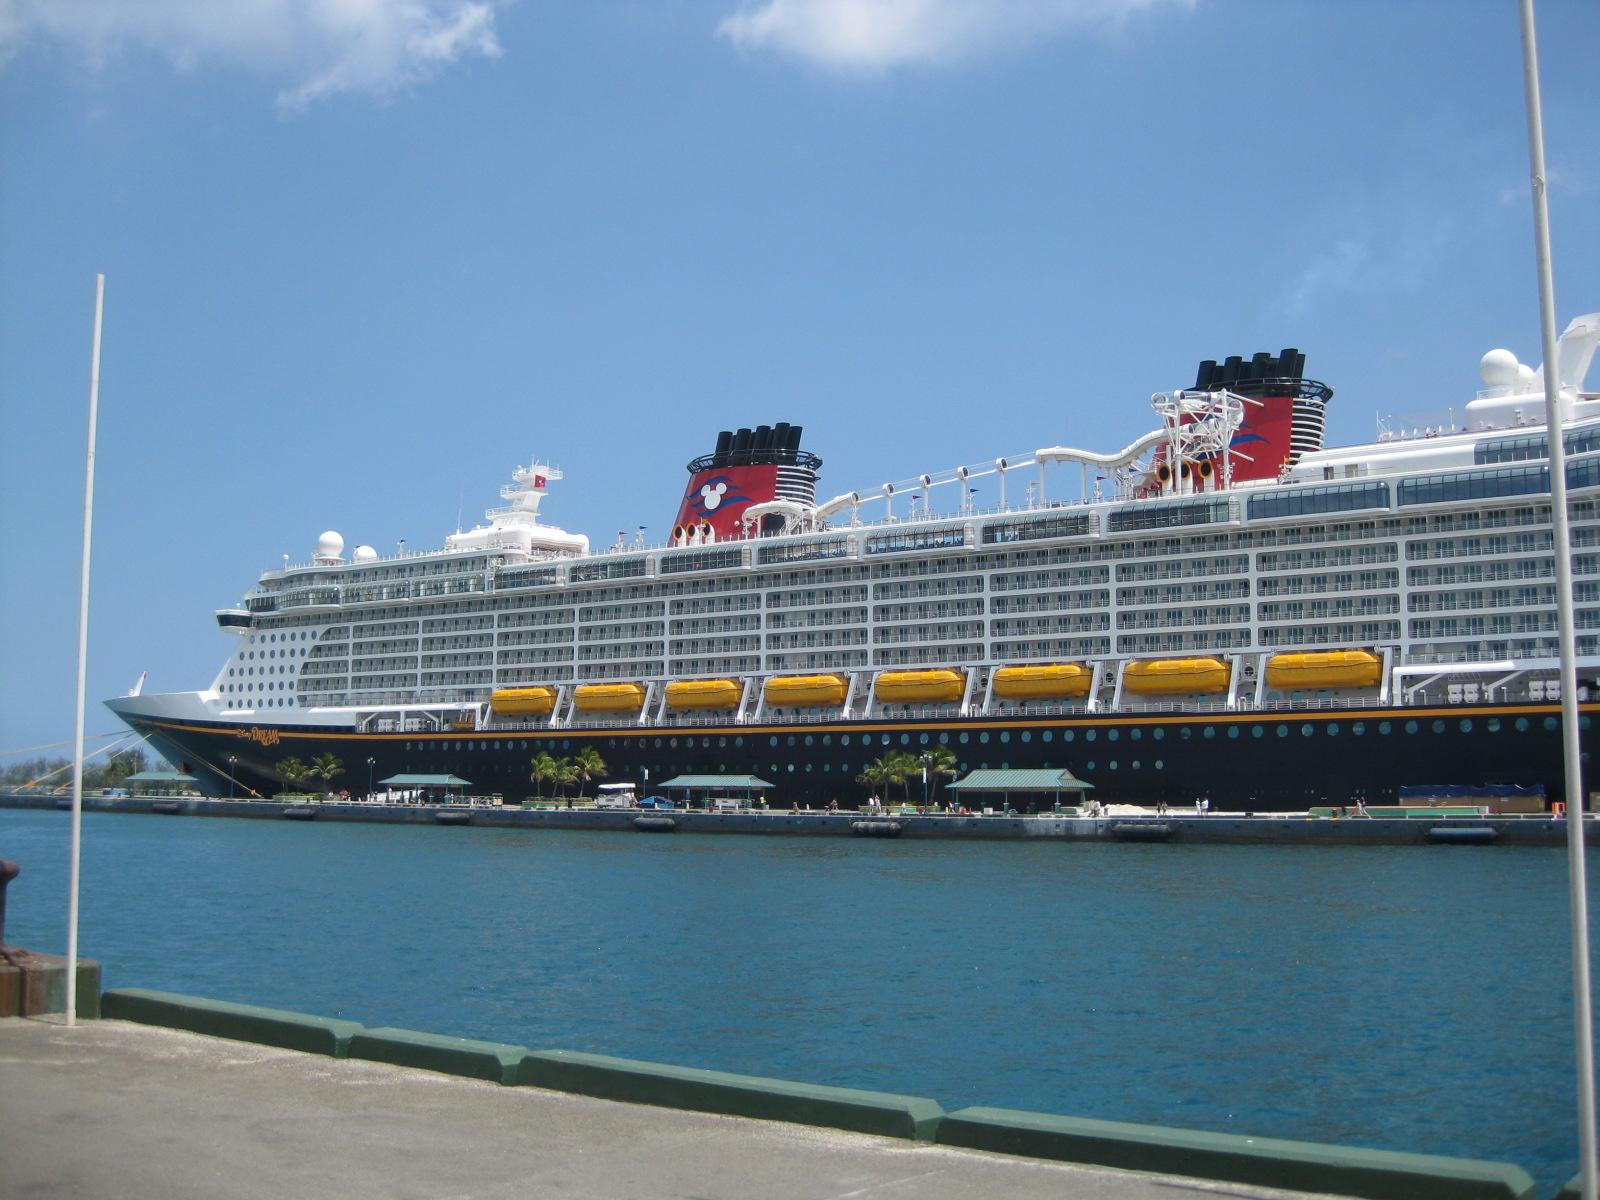 create an immersive brand part 1 Disney Dream cruise ship in port 1600x1200